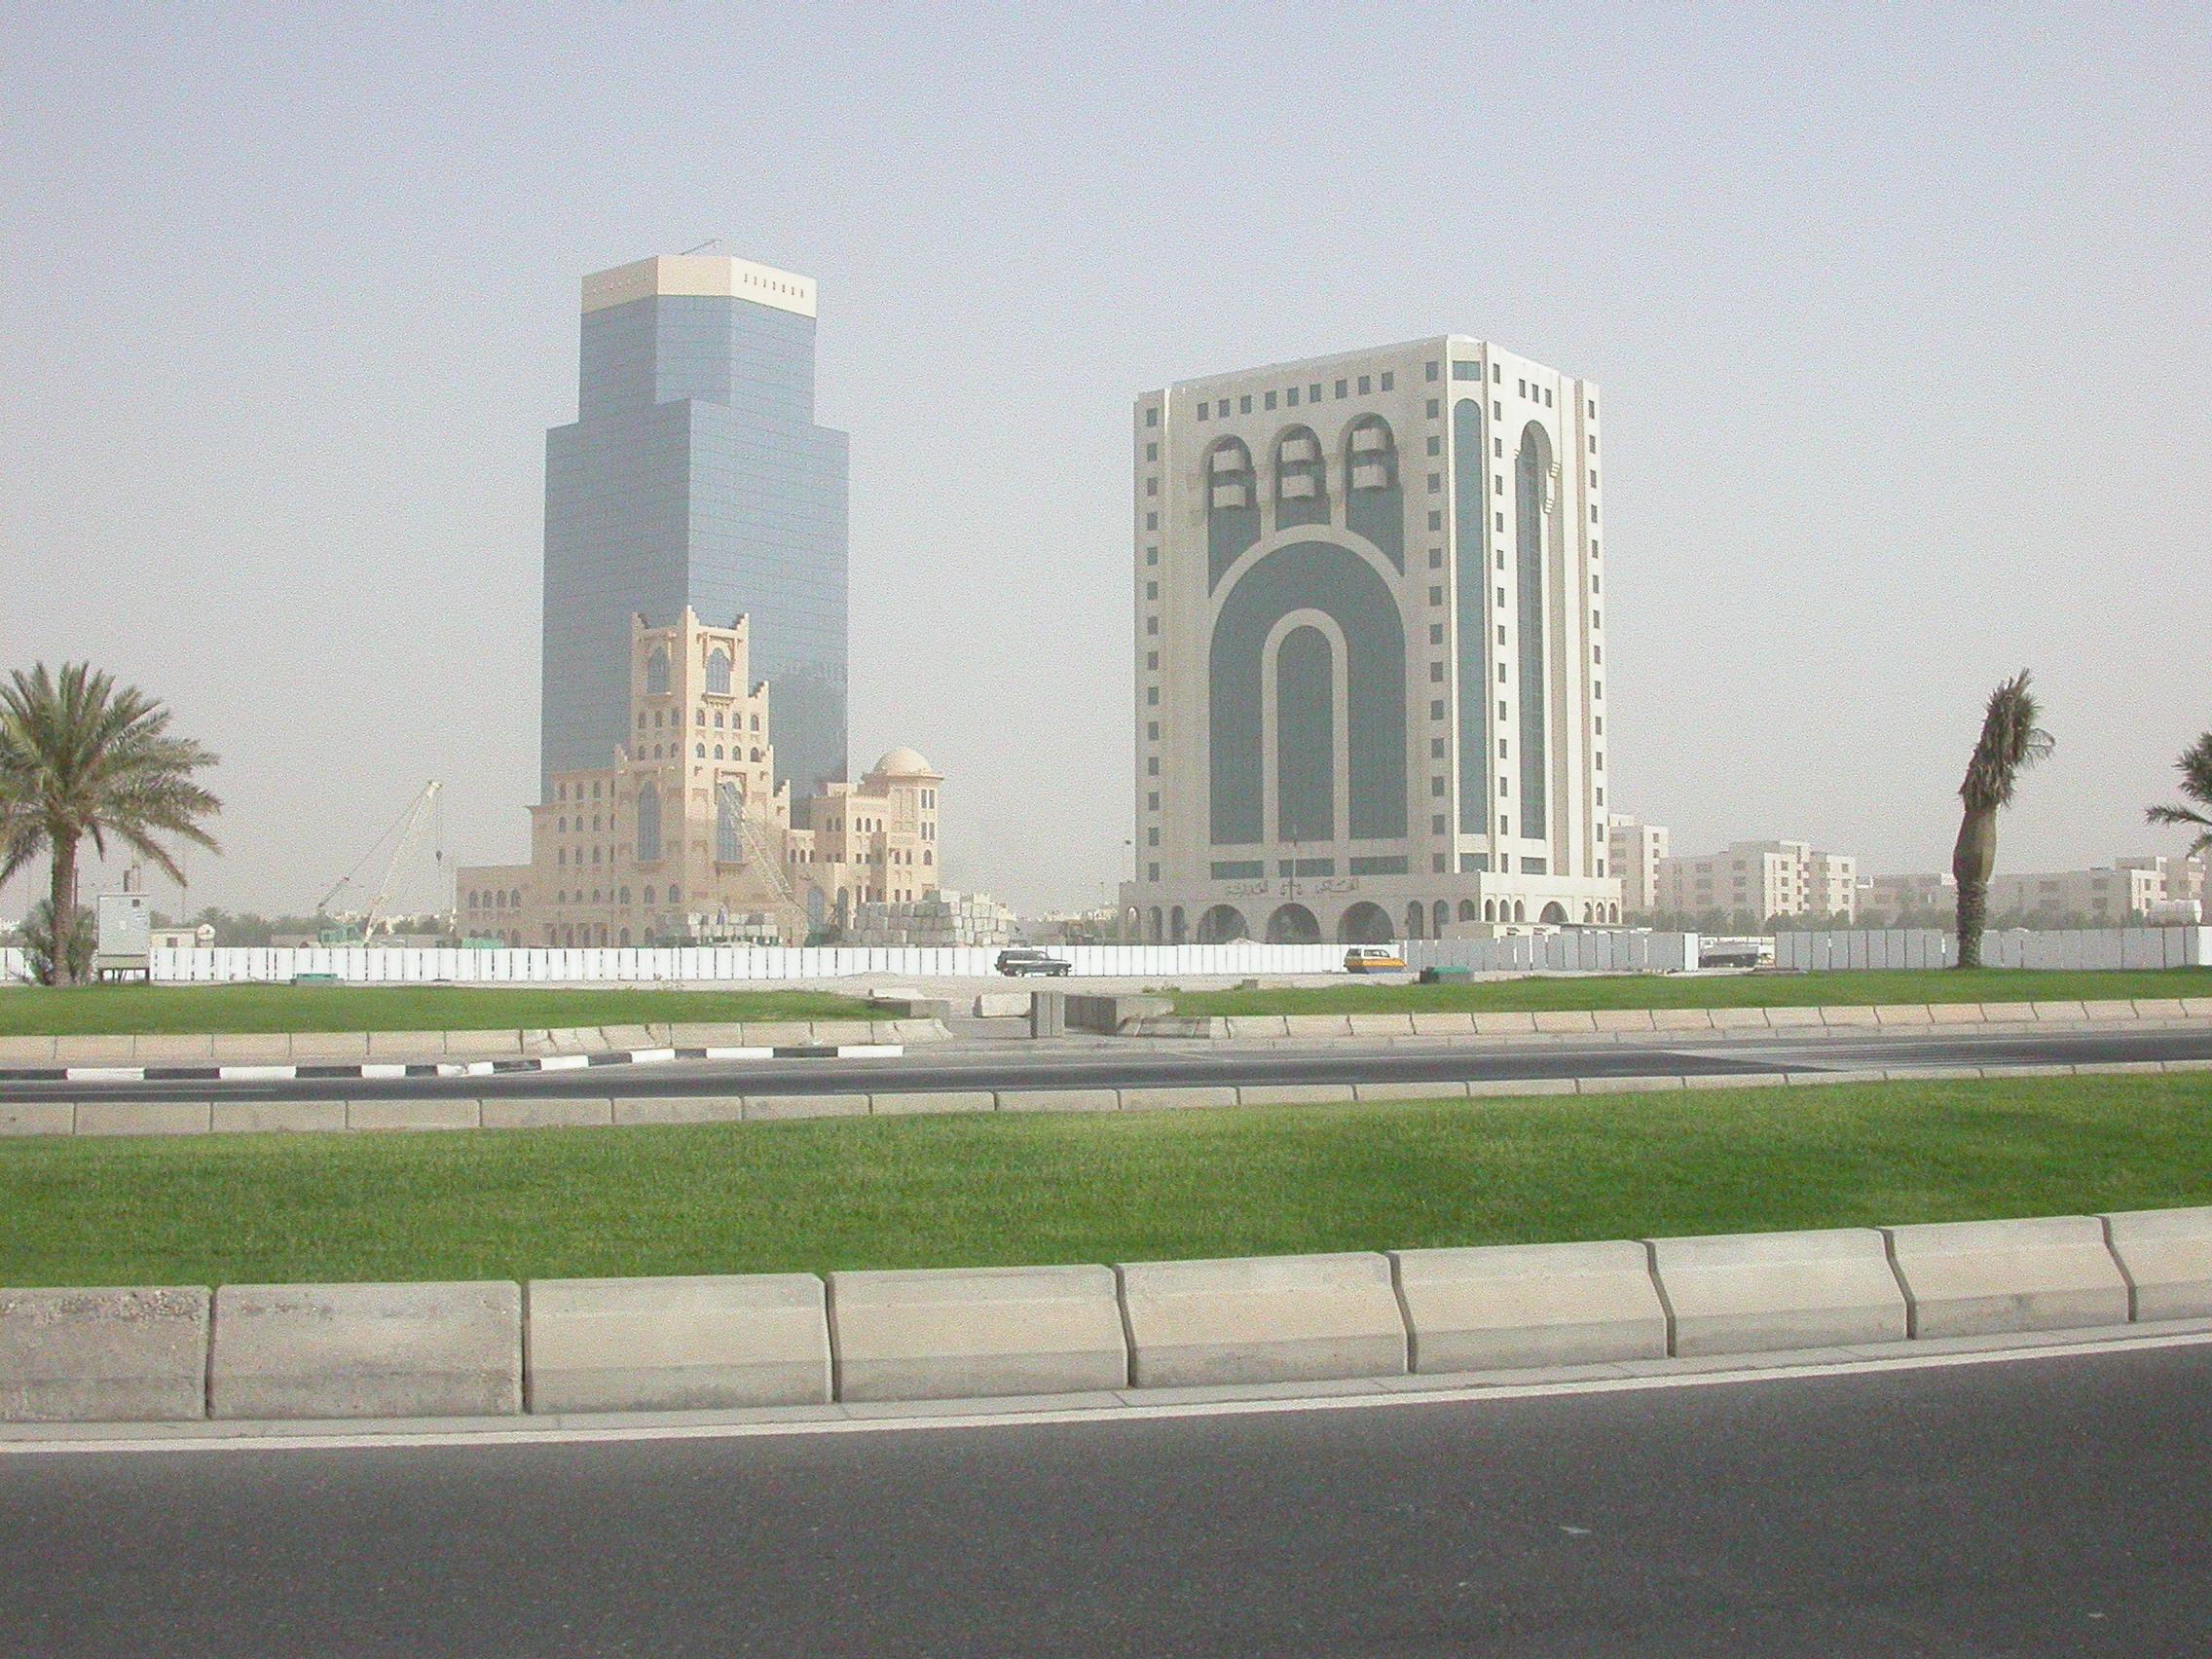 QA_City_Building Embedded 1.jpg